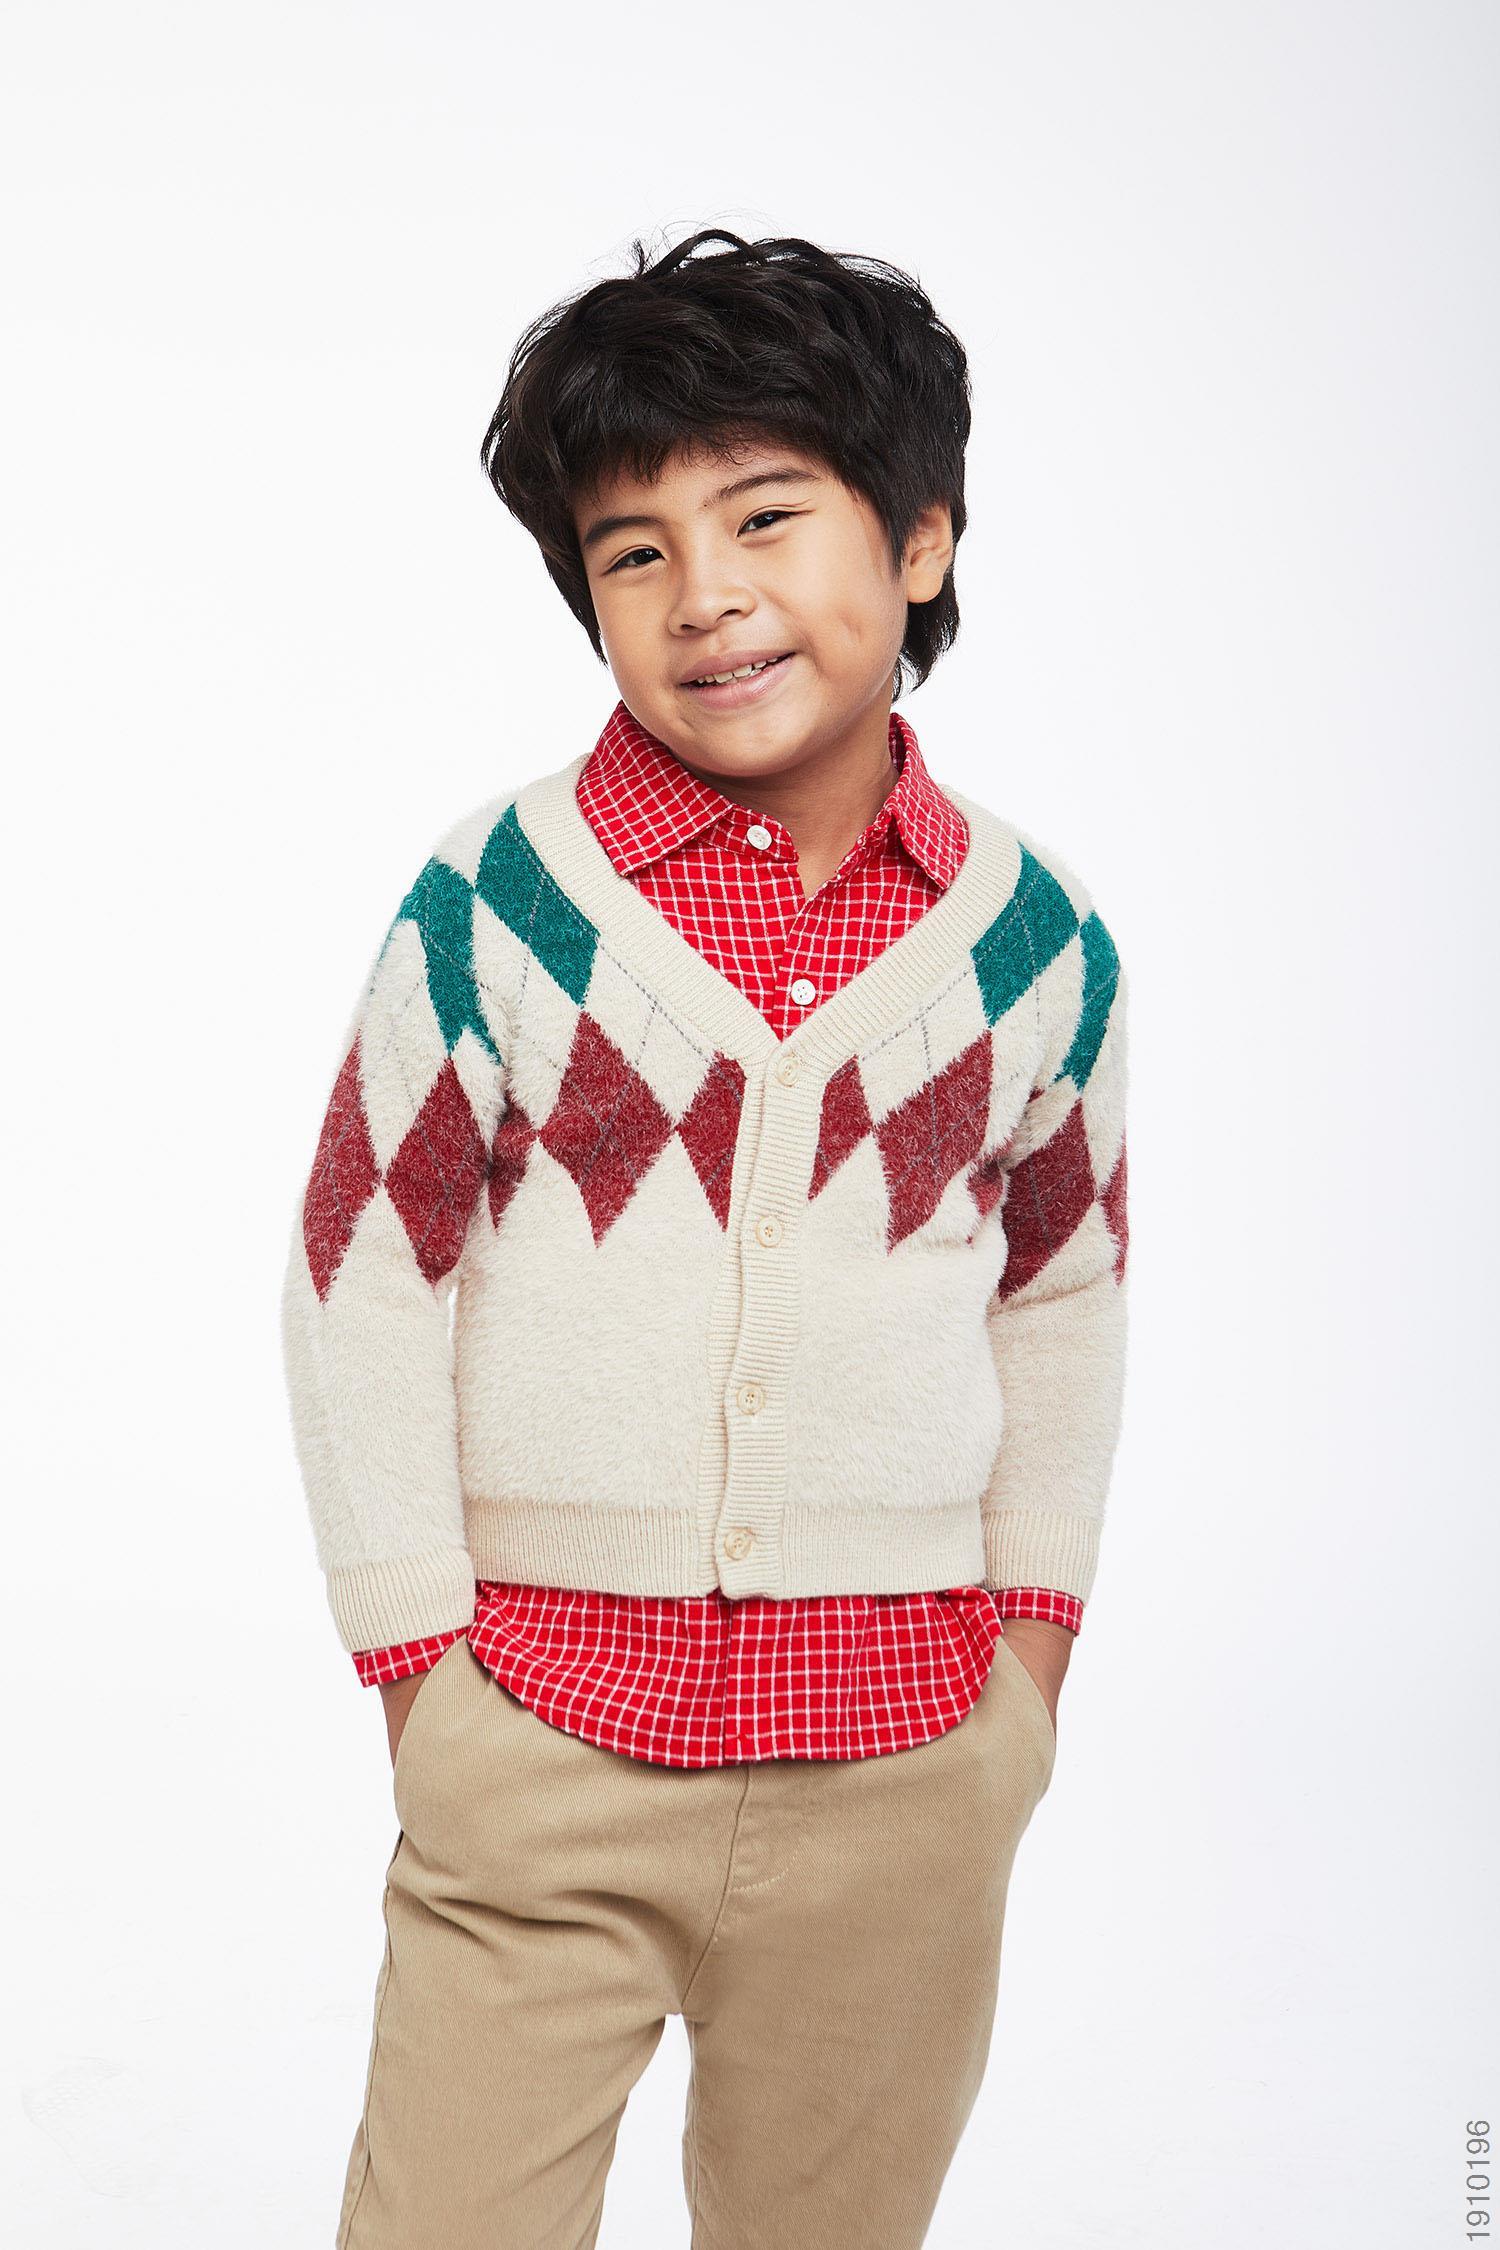 áo dệt bé trai - 1910196